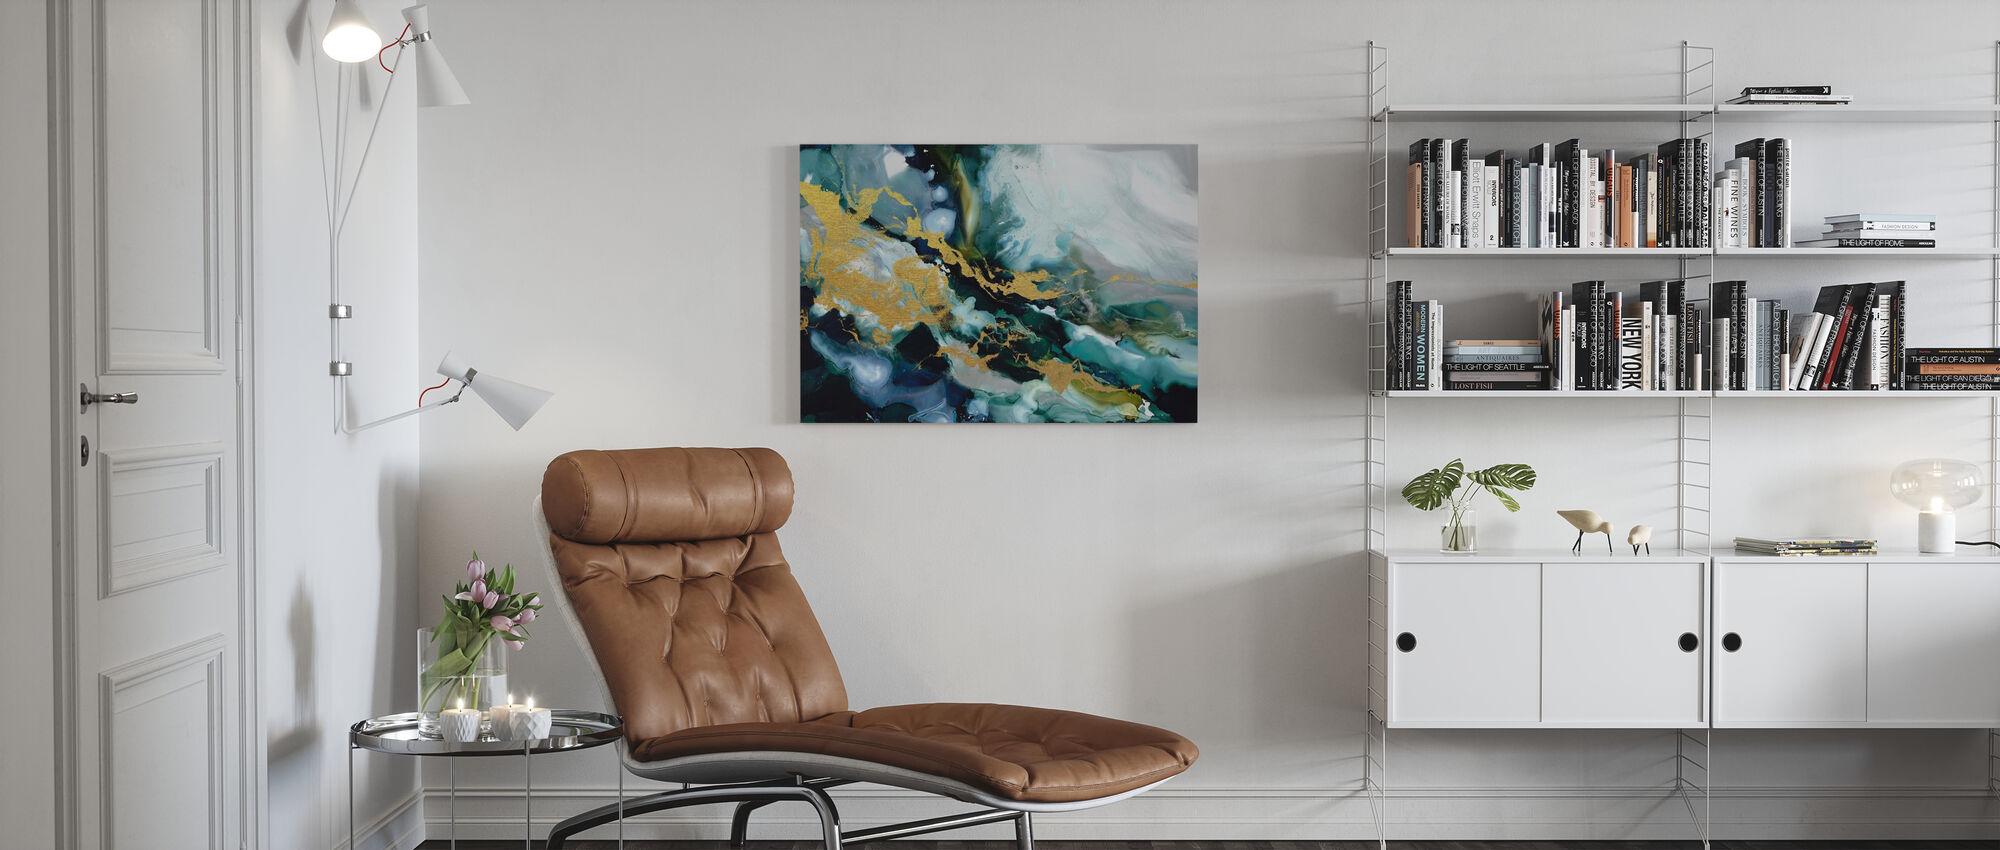 Golden Riptide - Canvas print - Living Room